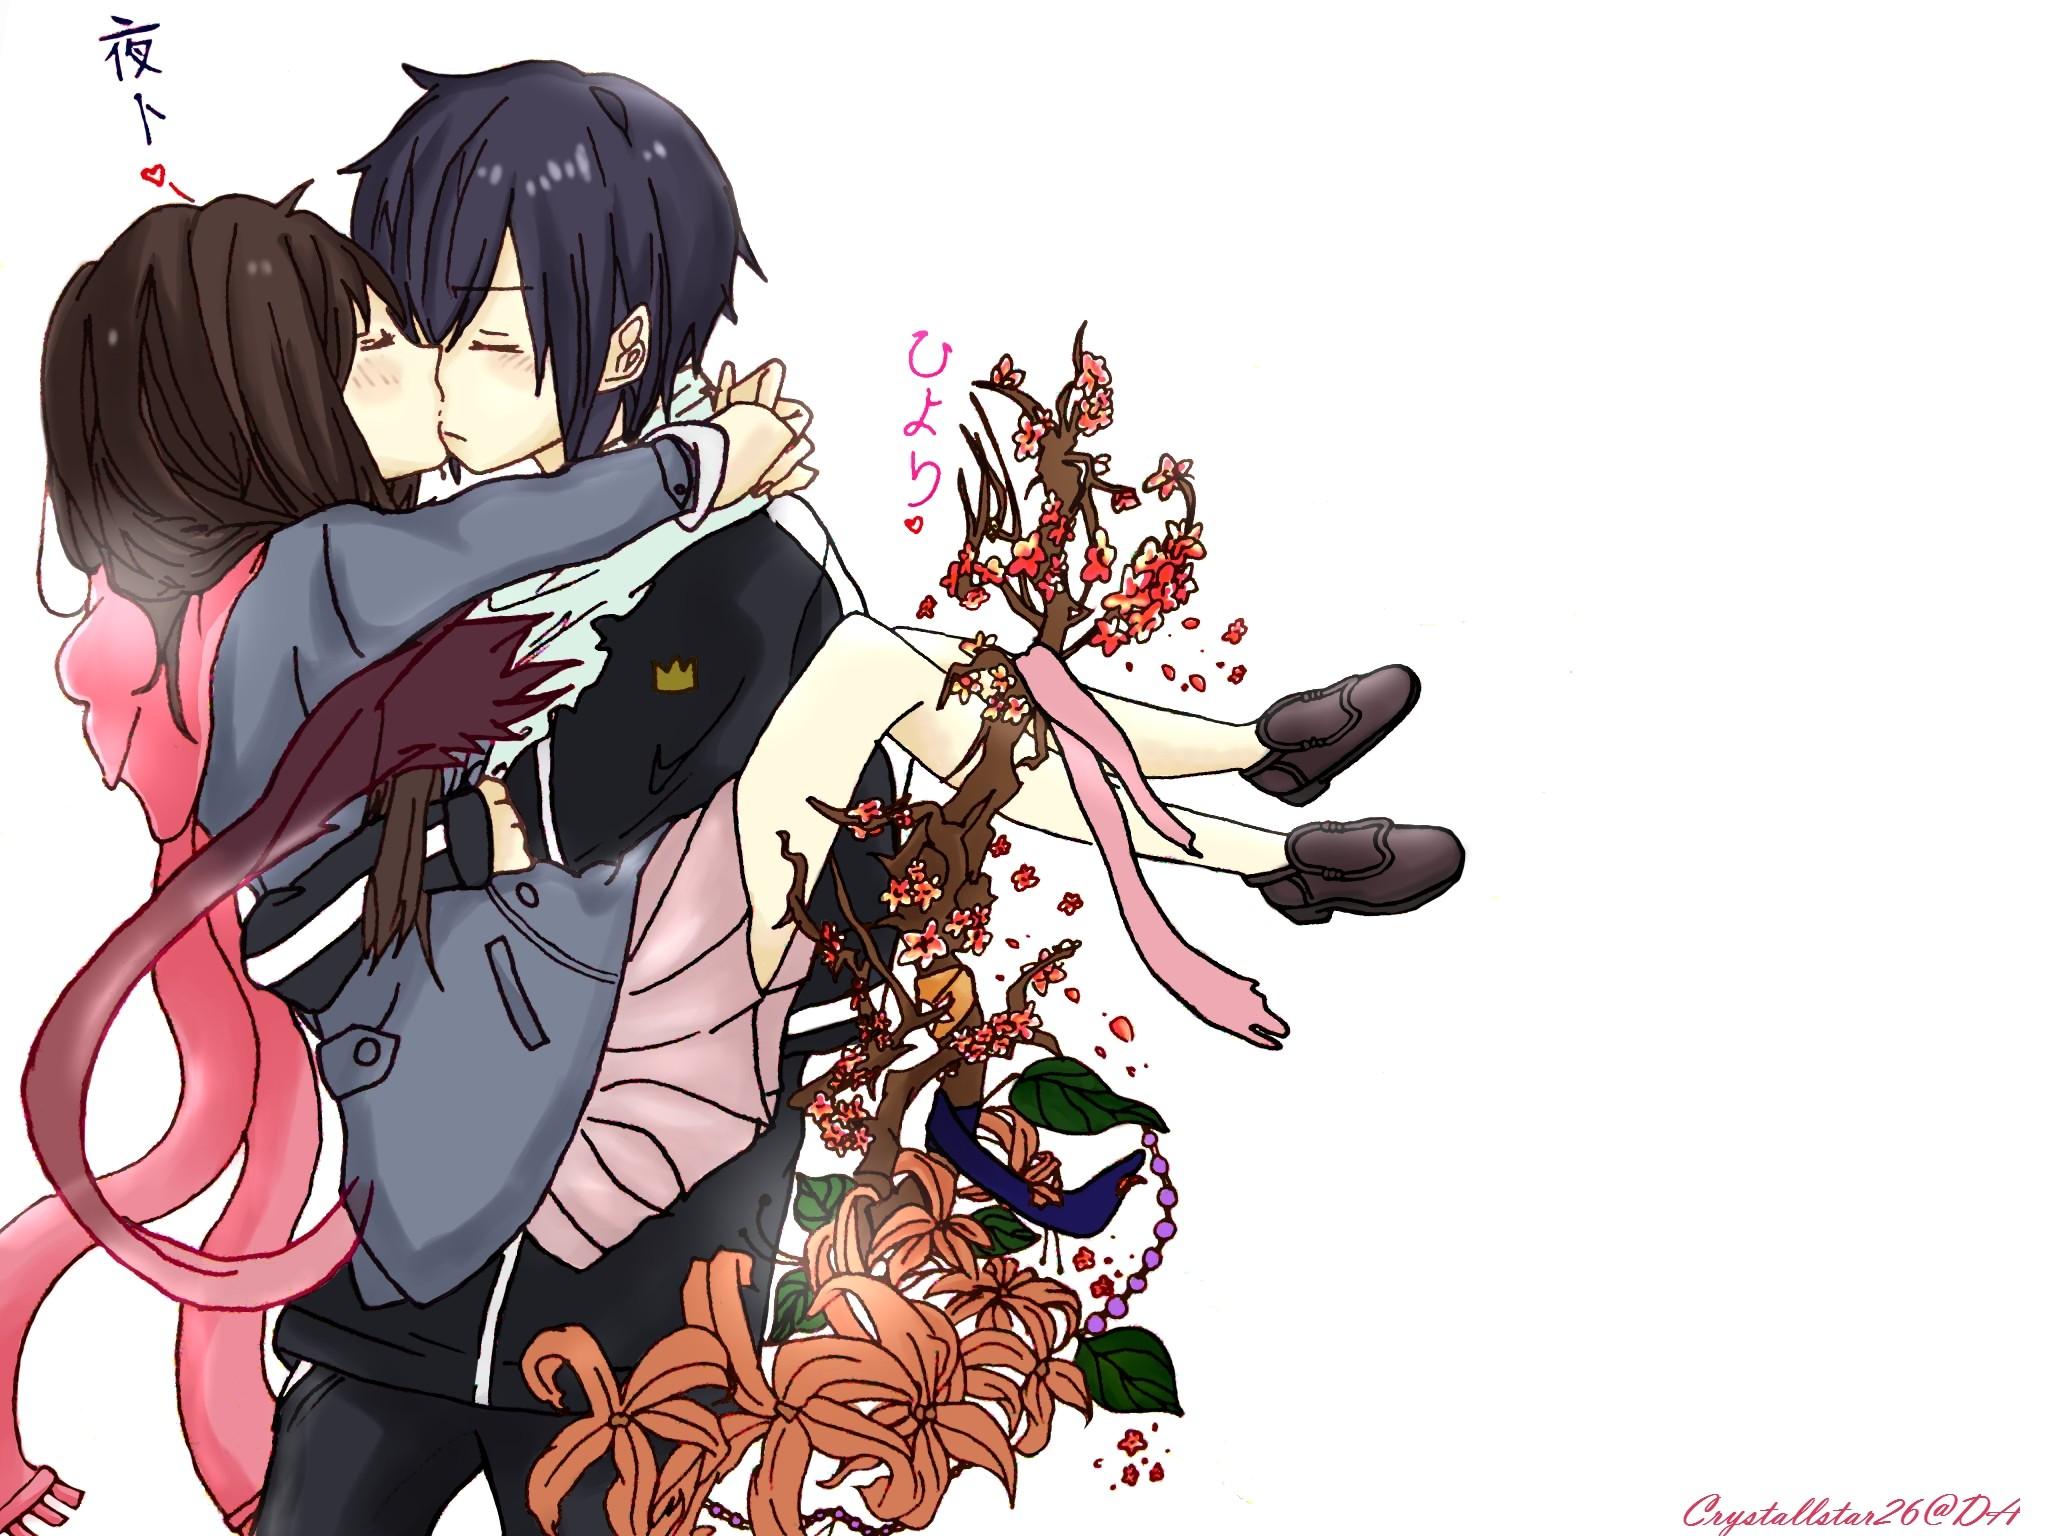 Anime – Noragami Hiyori Iki Yato (Noragami) Wallpaper